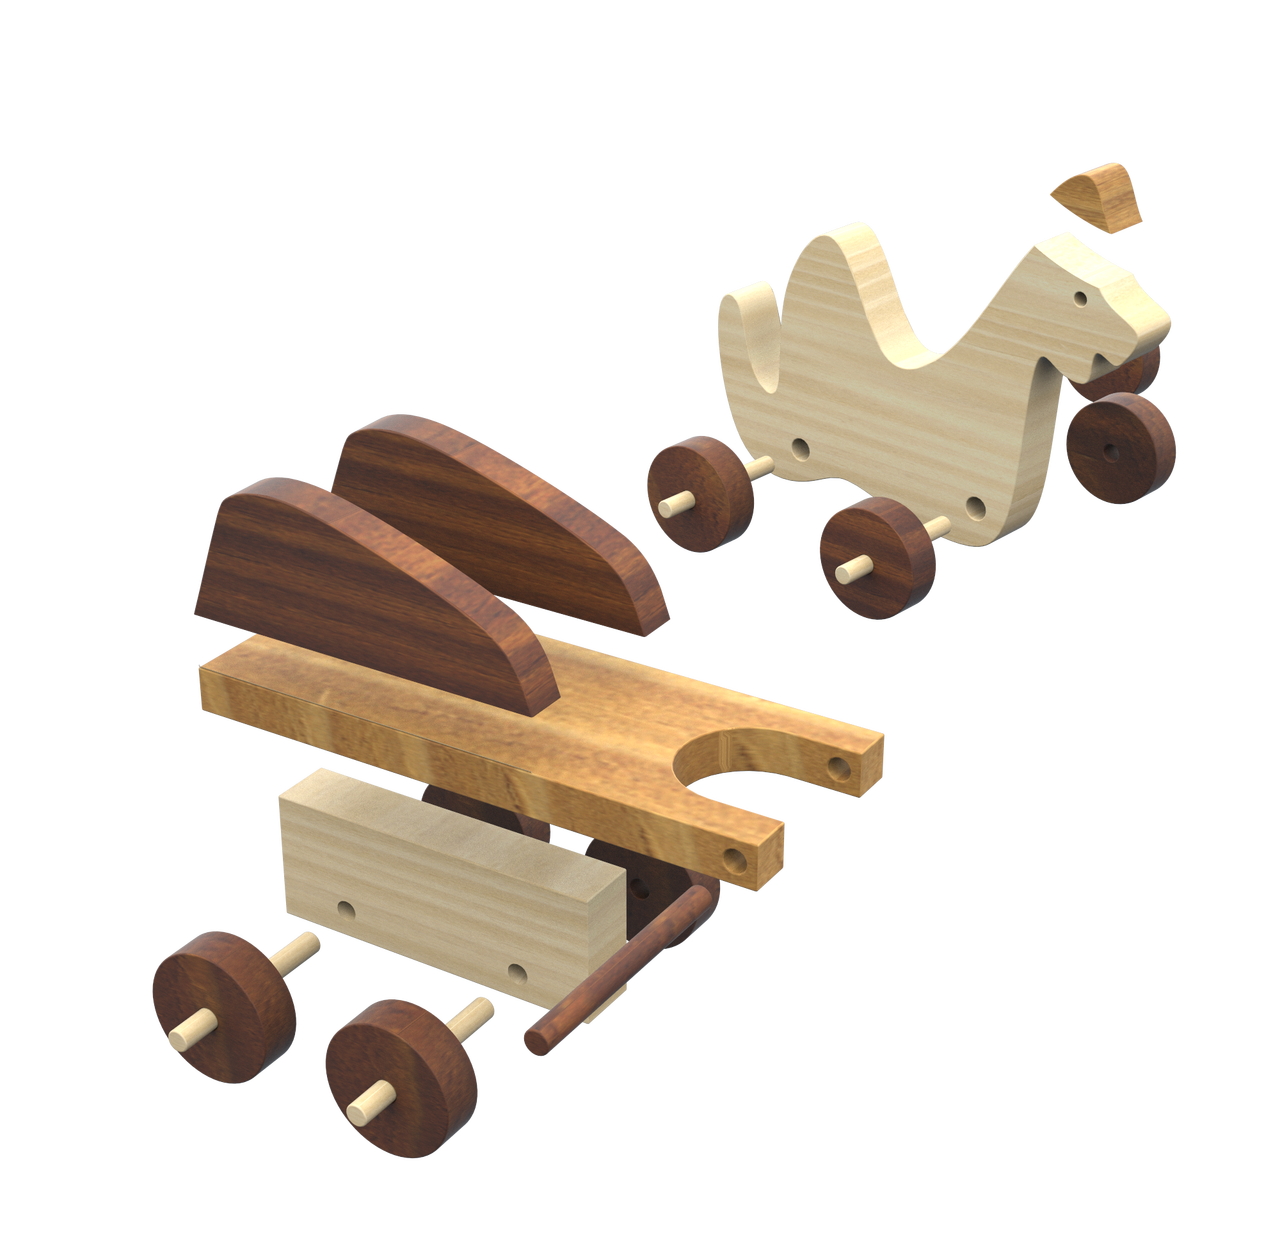 zoo carpet buddies and cavekids & dinosaurs wood toy plans (2 pdf downloads)